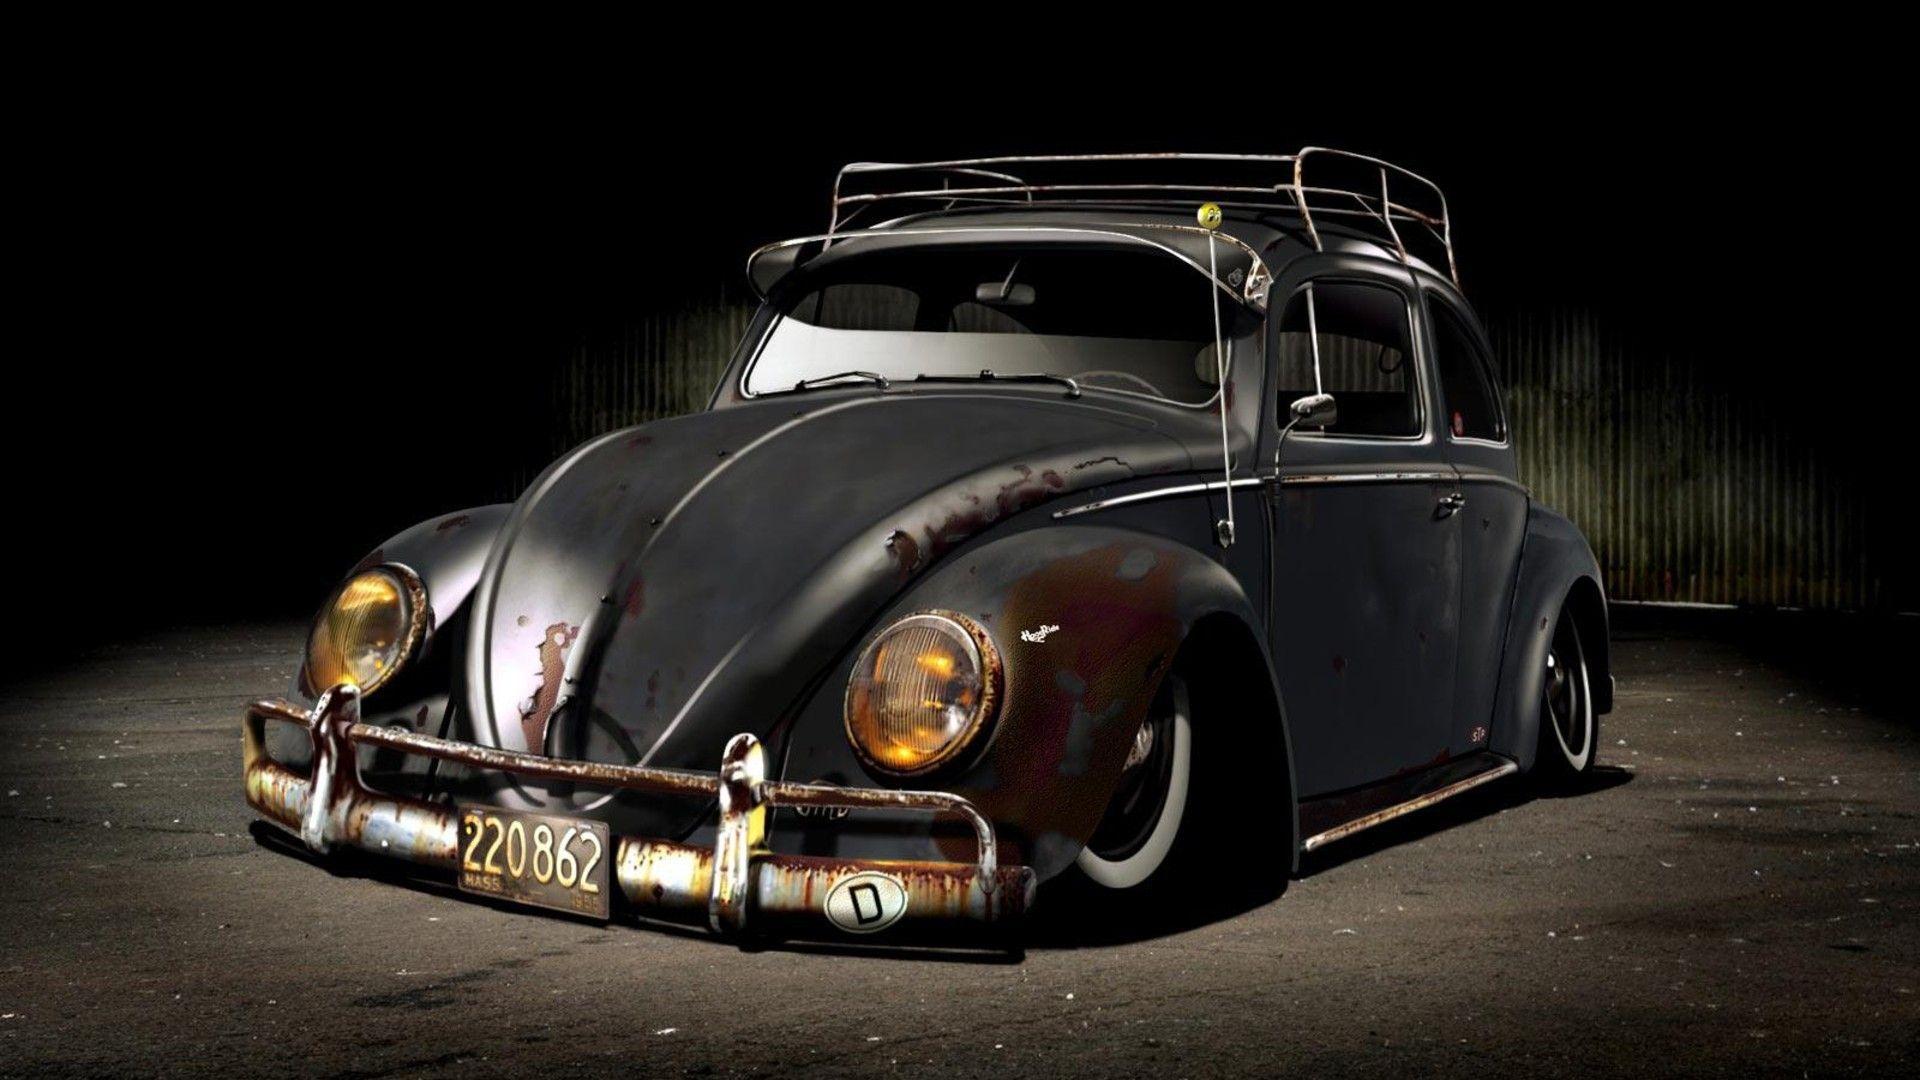 Volkswagen Beetle Wallpaper High Definition 1Yq Cool car 1920x1080